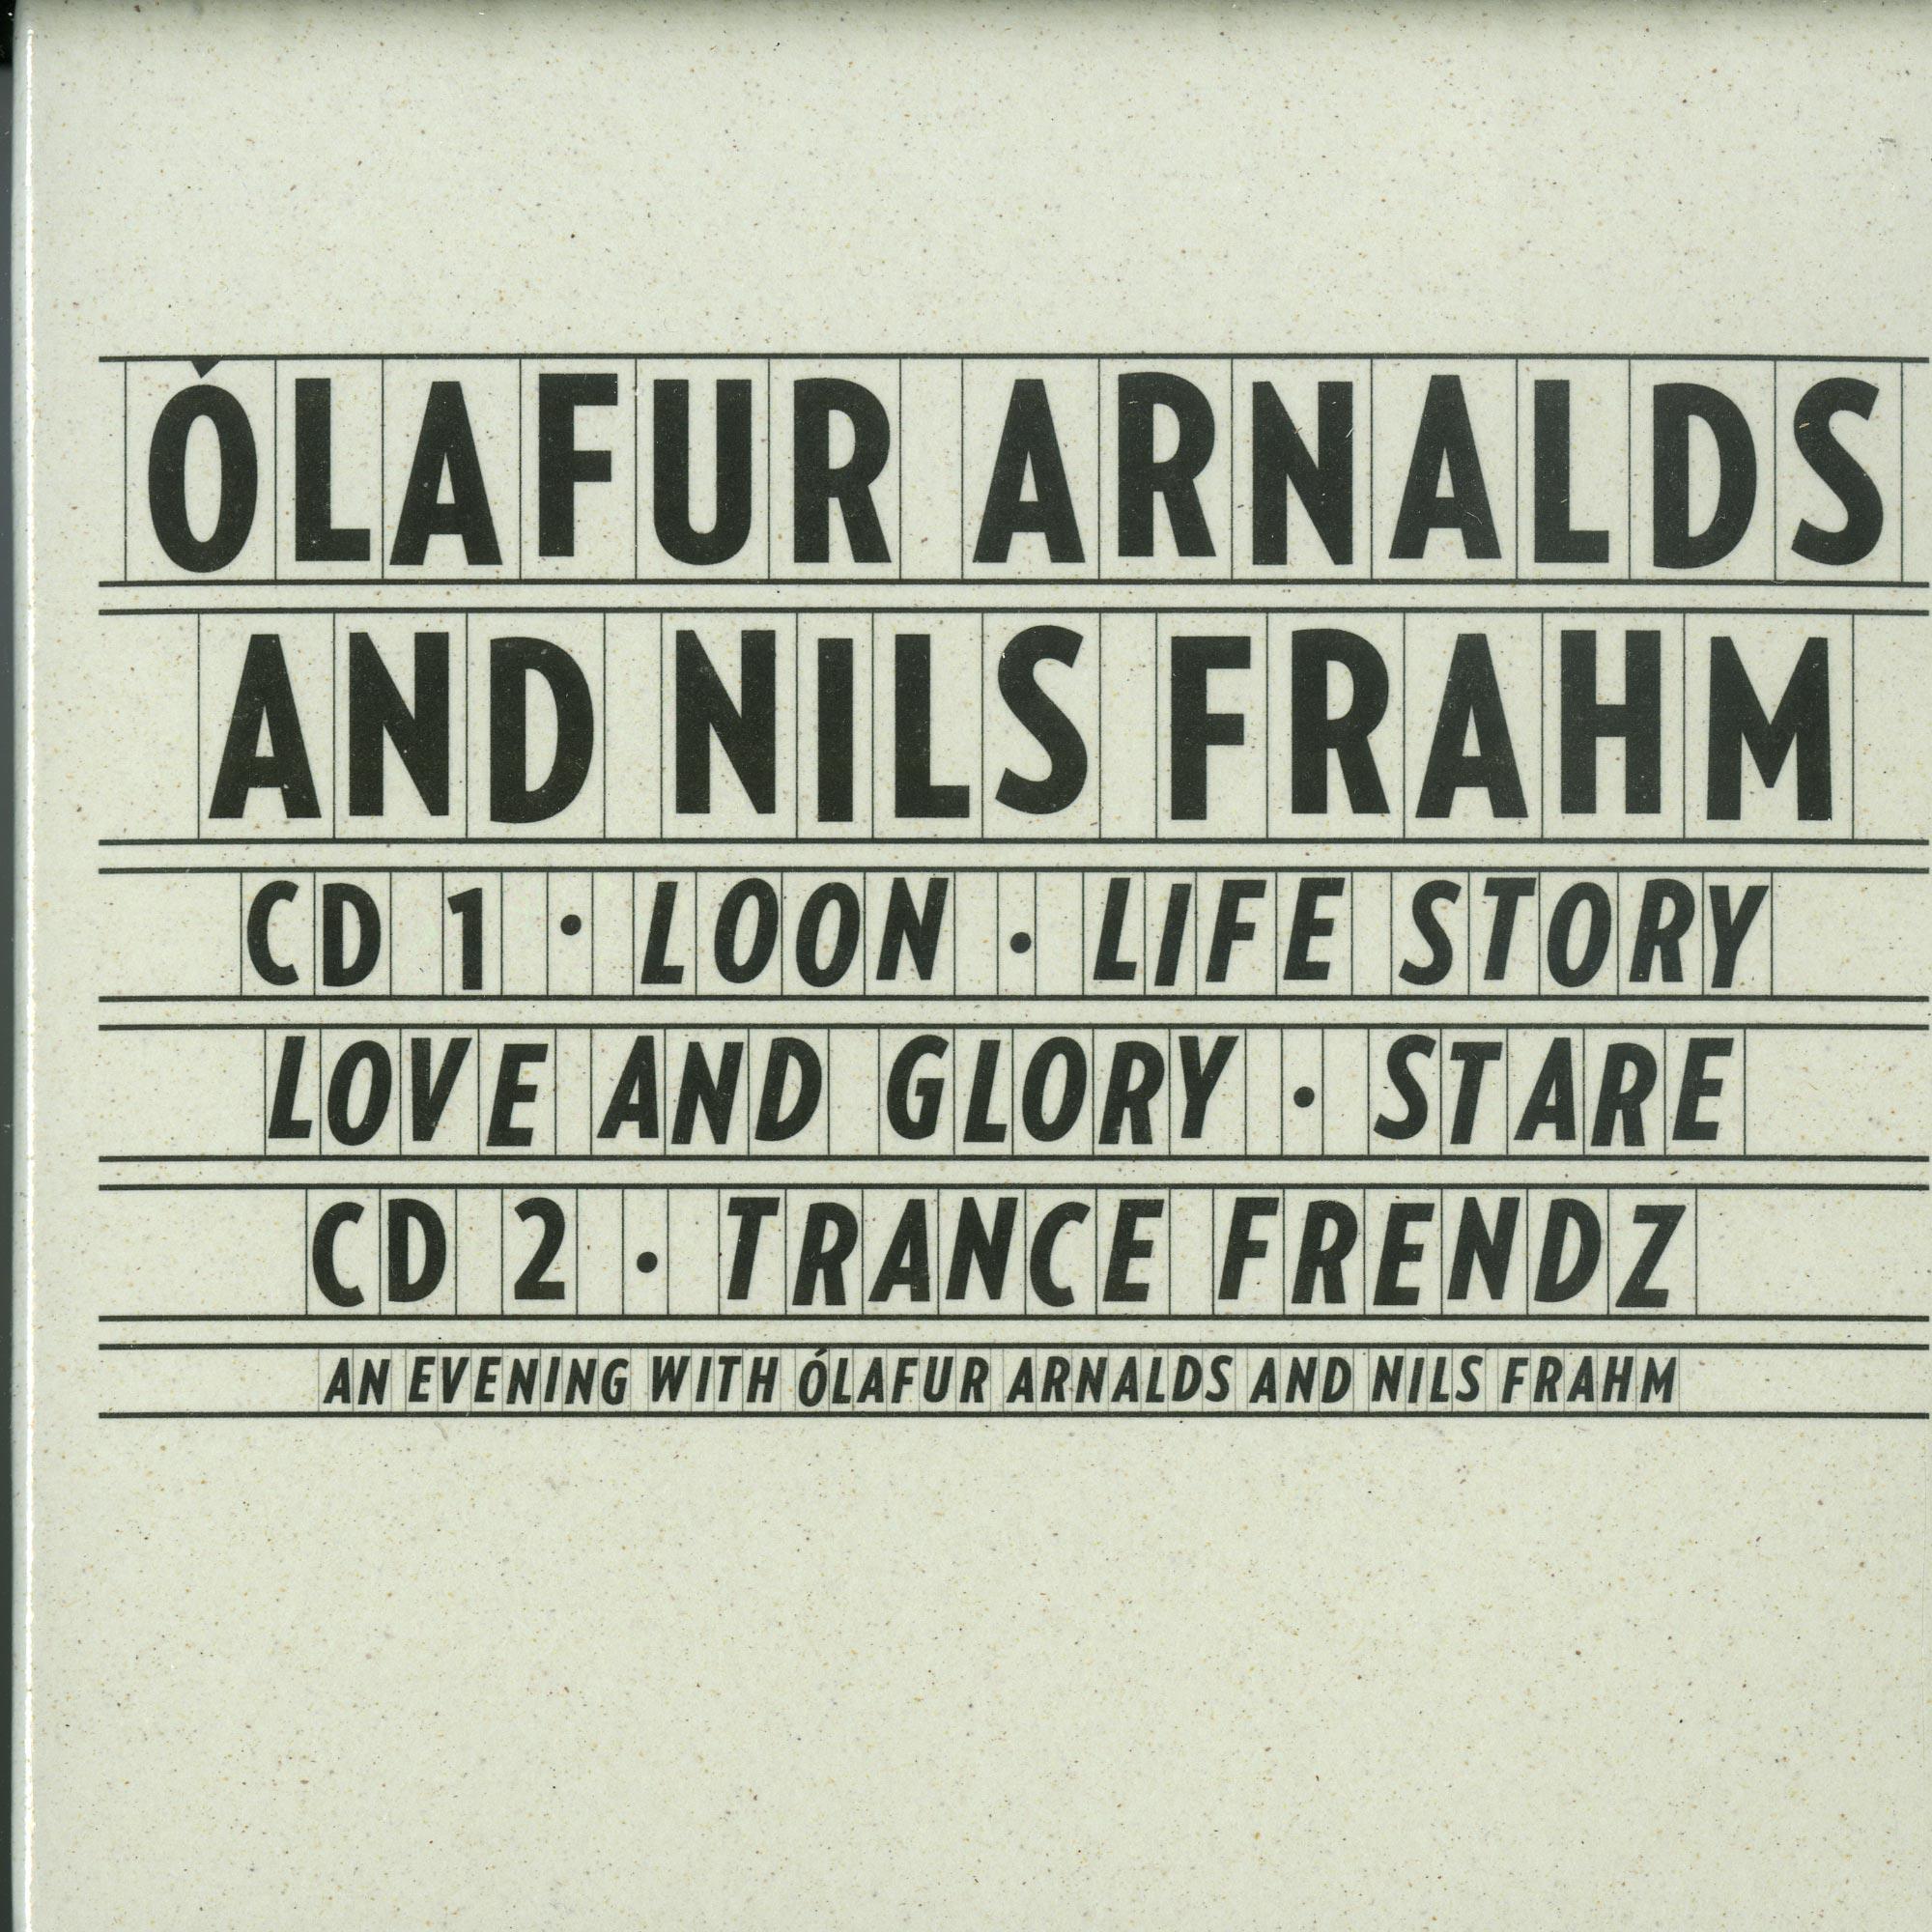 Olafur Arnalds & Nils Frahm - COLLABORATIVE WORKS